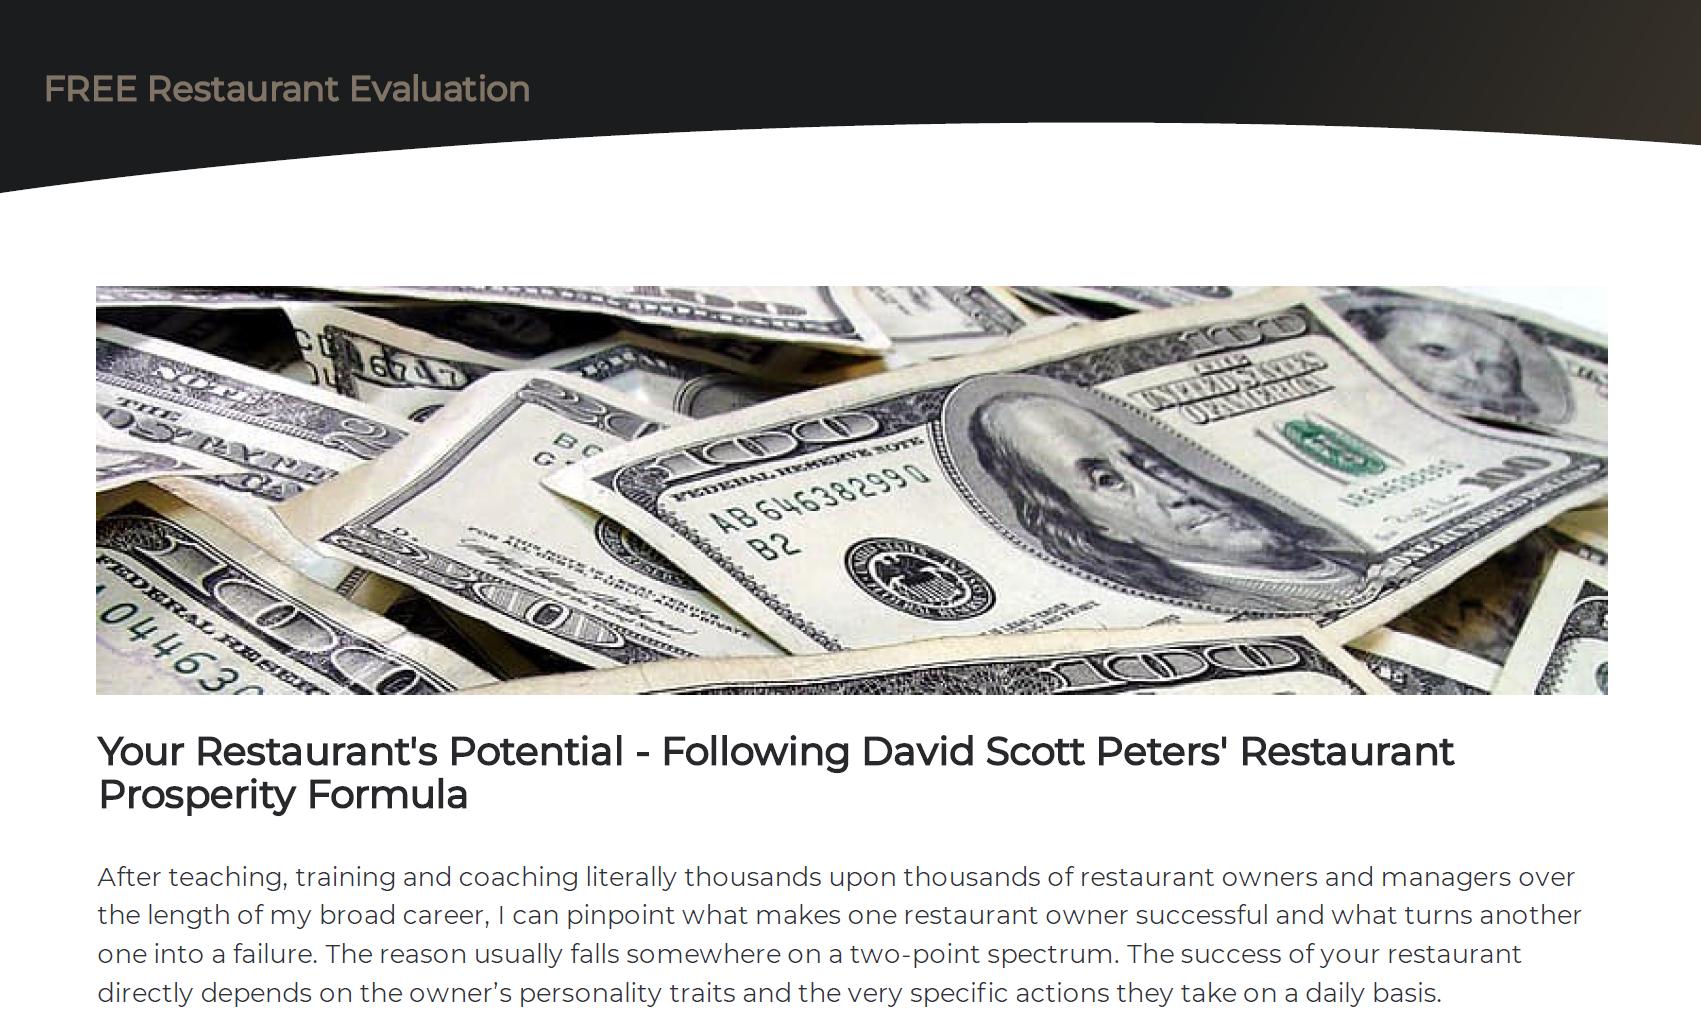 Free Restaurant Evaluation David Scott Peters Restaurant Prosperity Formula